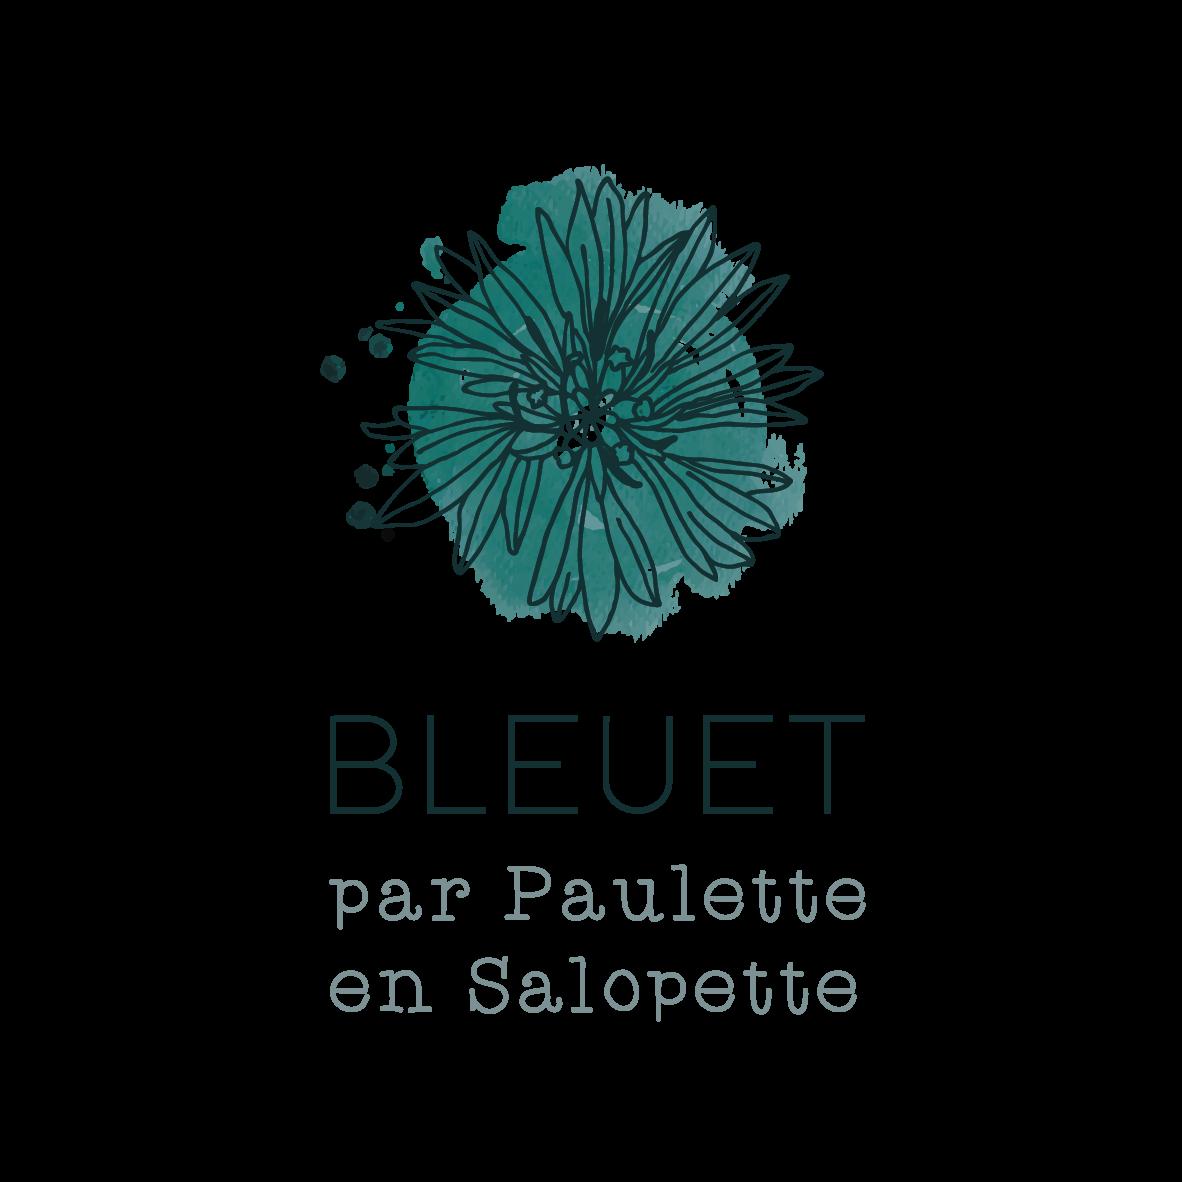 Logo_Bleuet-02